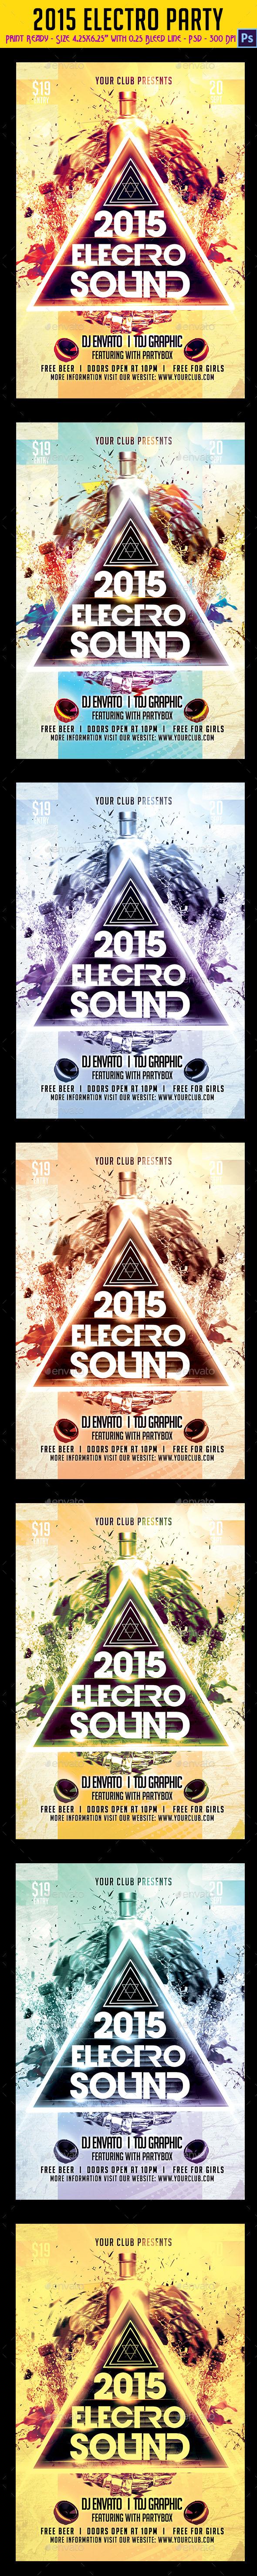 GraphicRiver 2015 Electro Party Flyer 9631005